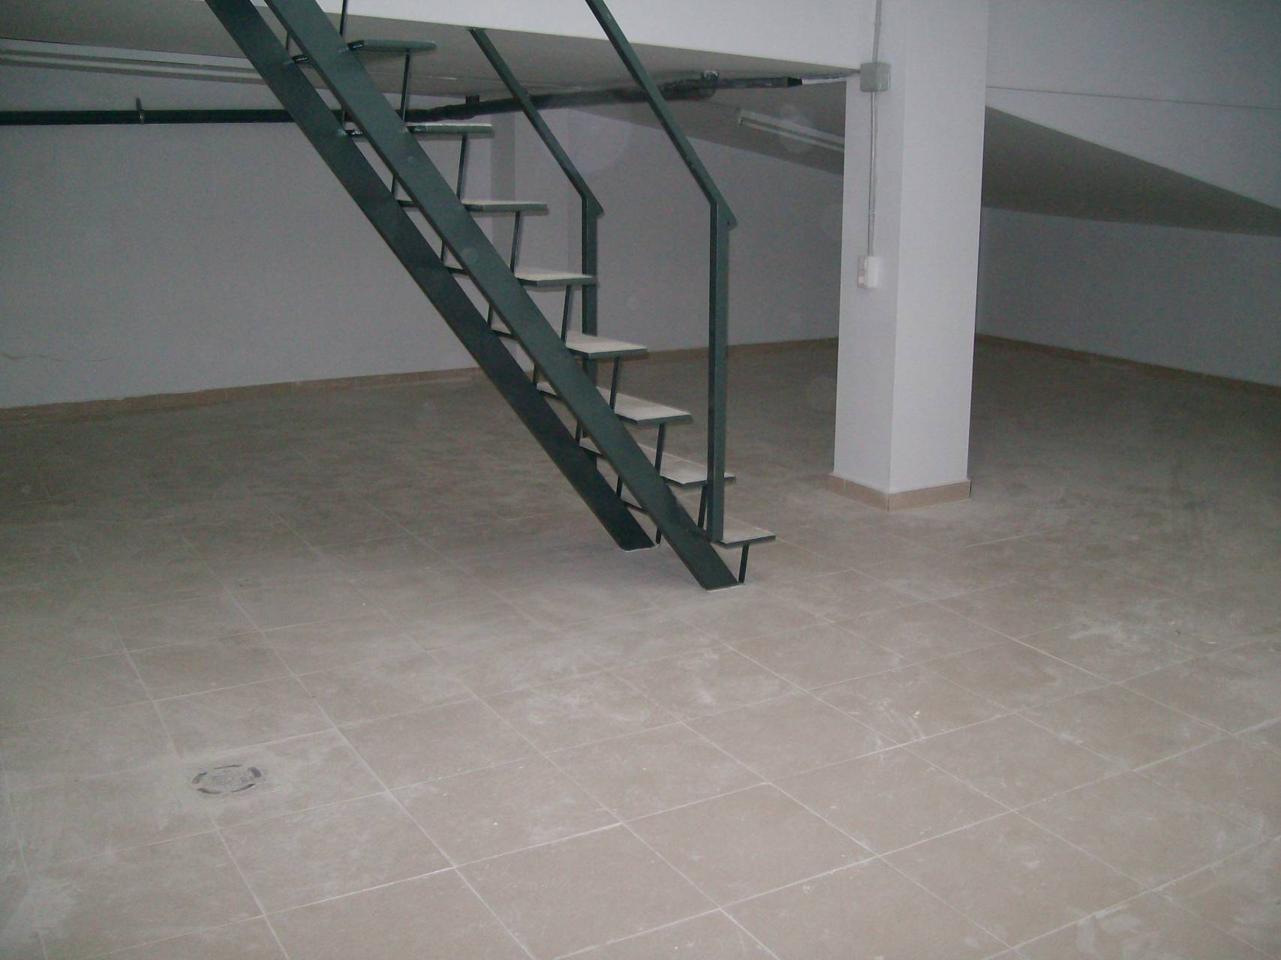 local-comercial en montornes-del-valles · avinguda-d'ernest-lluch-08170 €